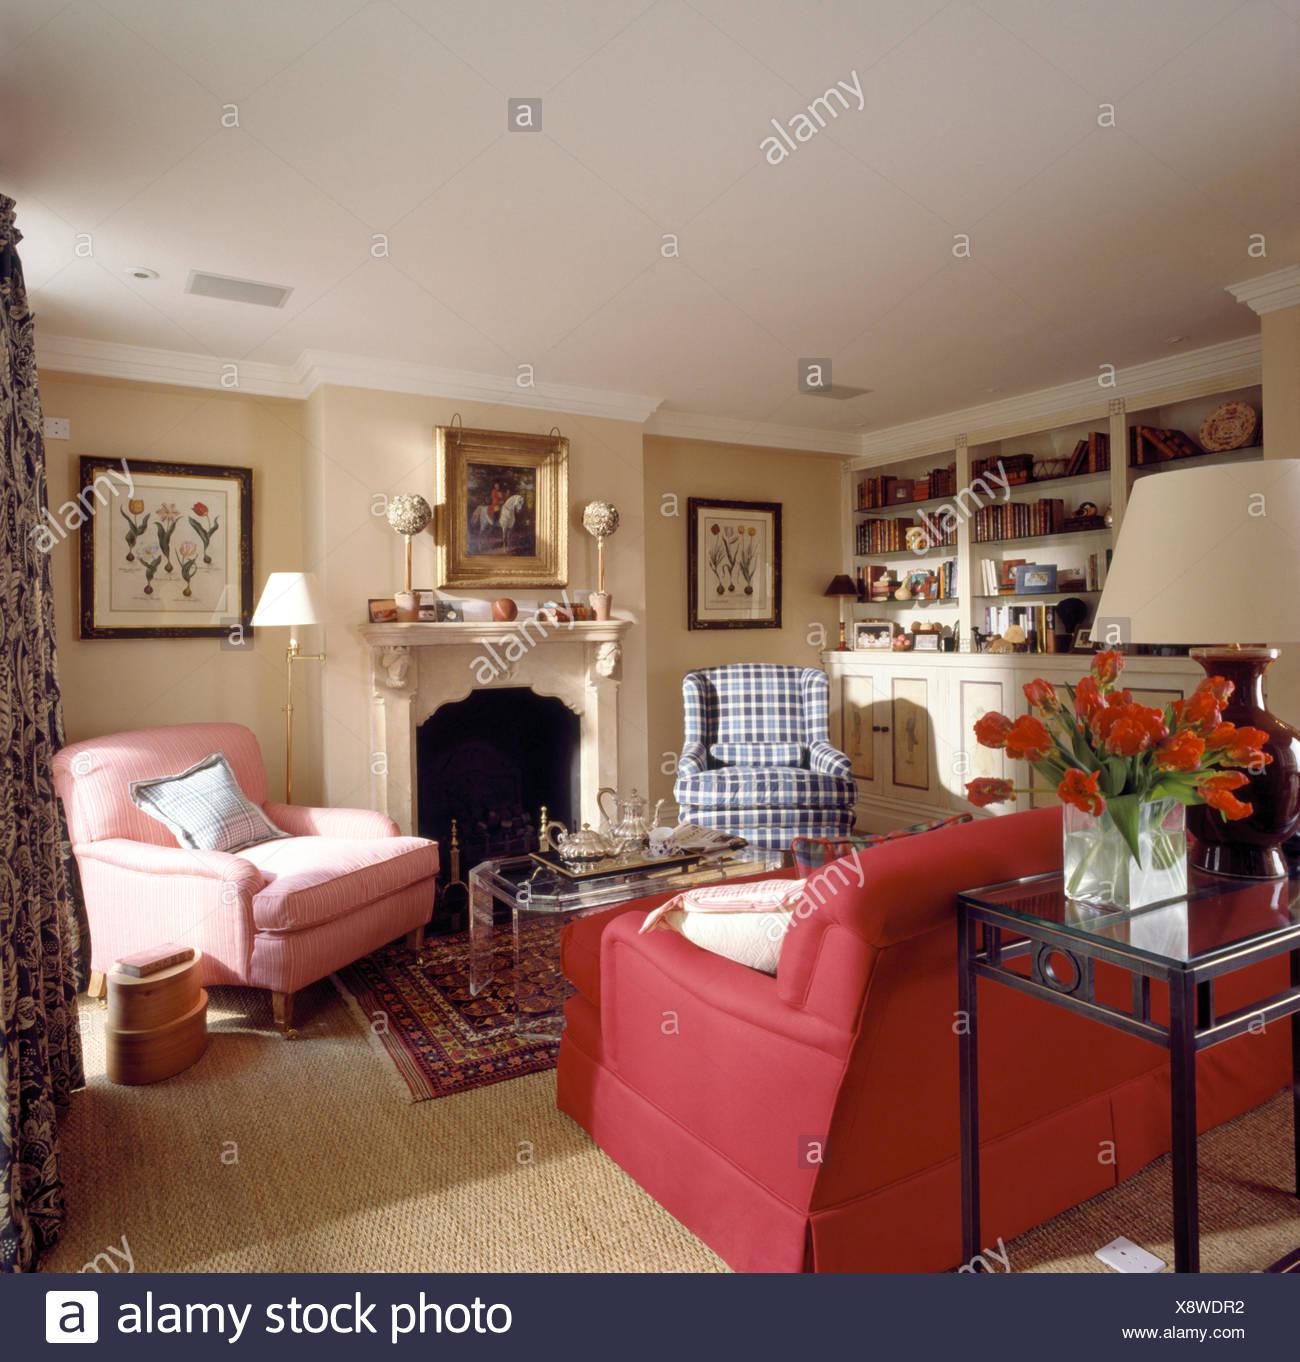 Rotes Sofa Und Rosa Sessel In Traditionellen Neunziger Jahre